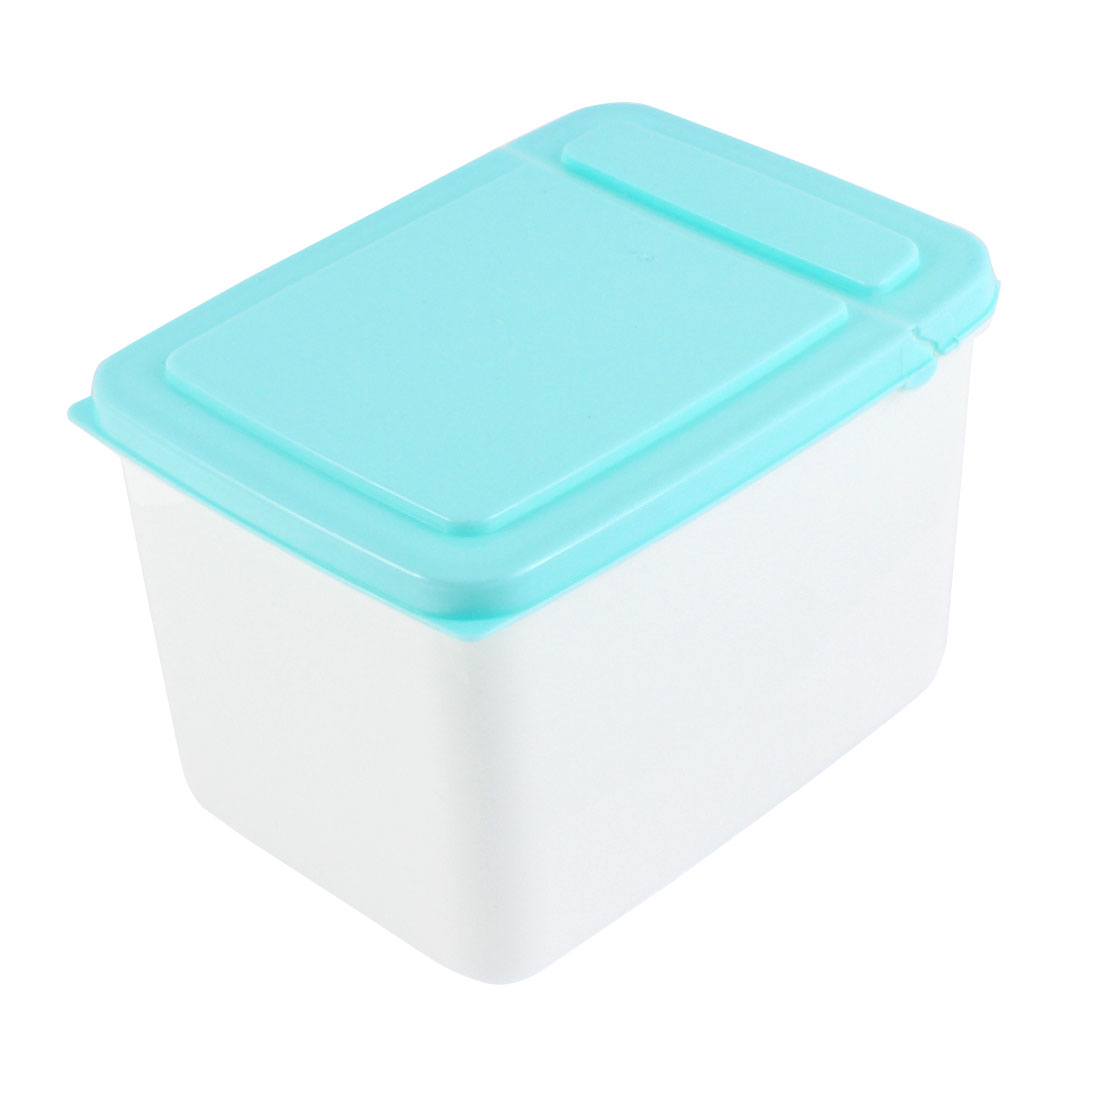 Office Plastic Food Storage Box Container 15cm x 11cm x 10cm 1.3L Blue